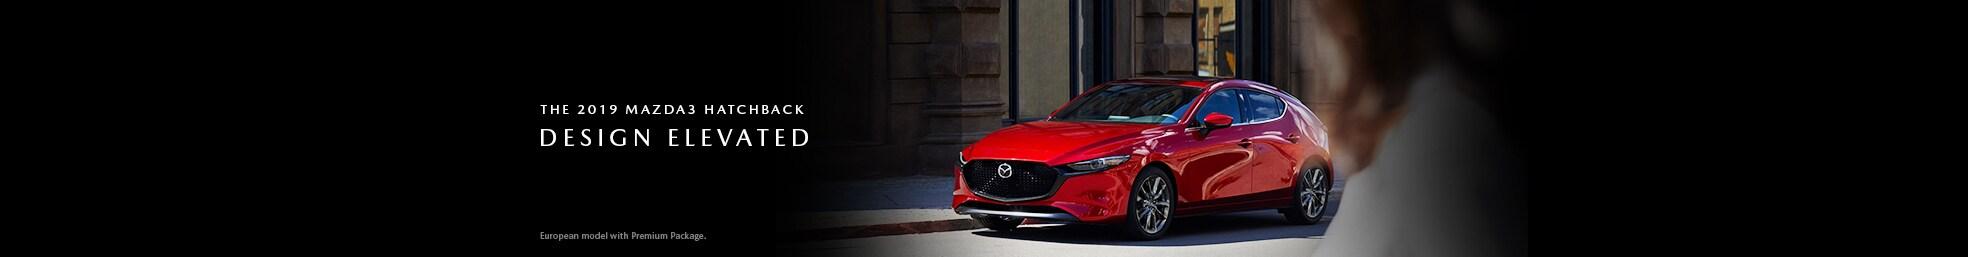 Mazda Dealership Buy New Amp Used Mazda Cars Springfield Mo